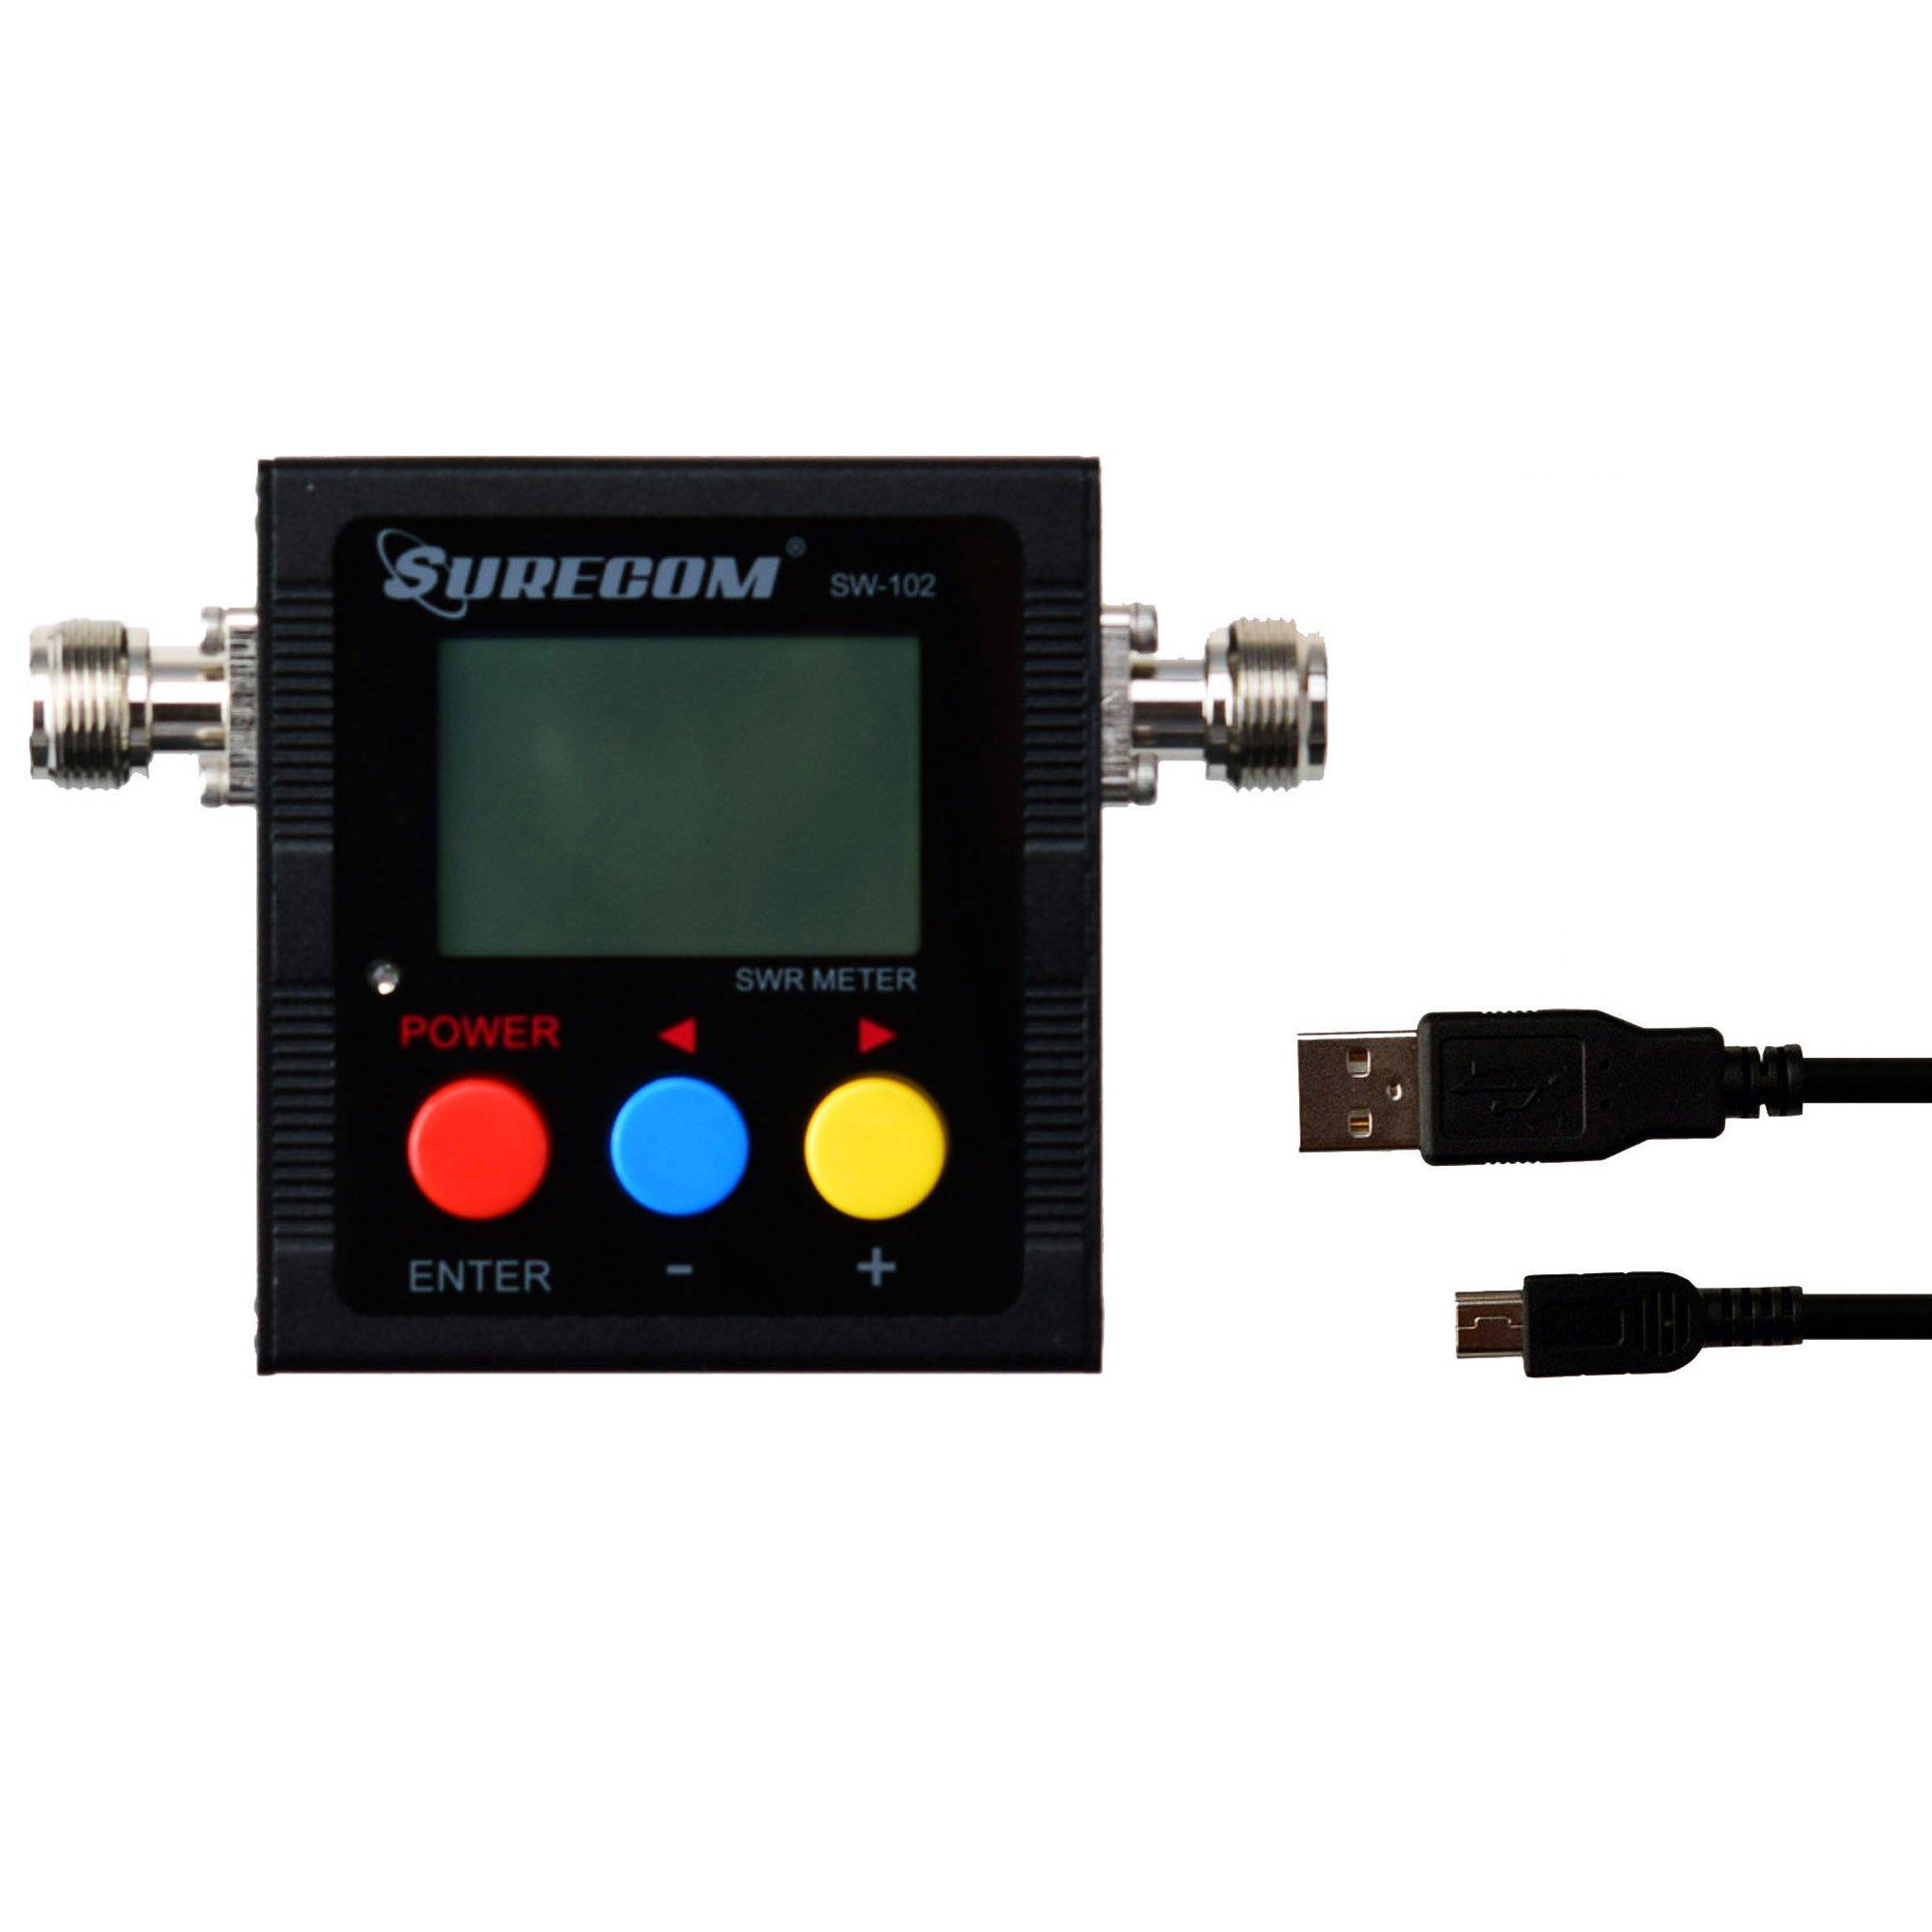 Gam3Gear Surecom SW-102S SO239 Connector Digital VHF UHF 125-525Mhz Power & SWR Meter